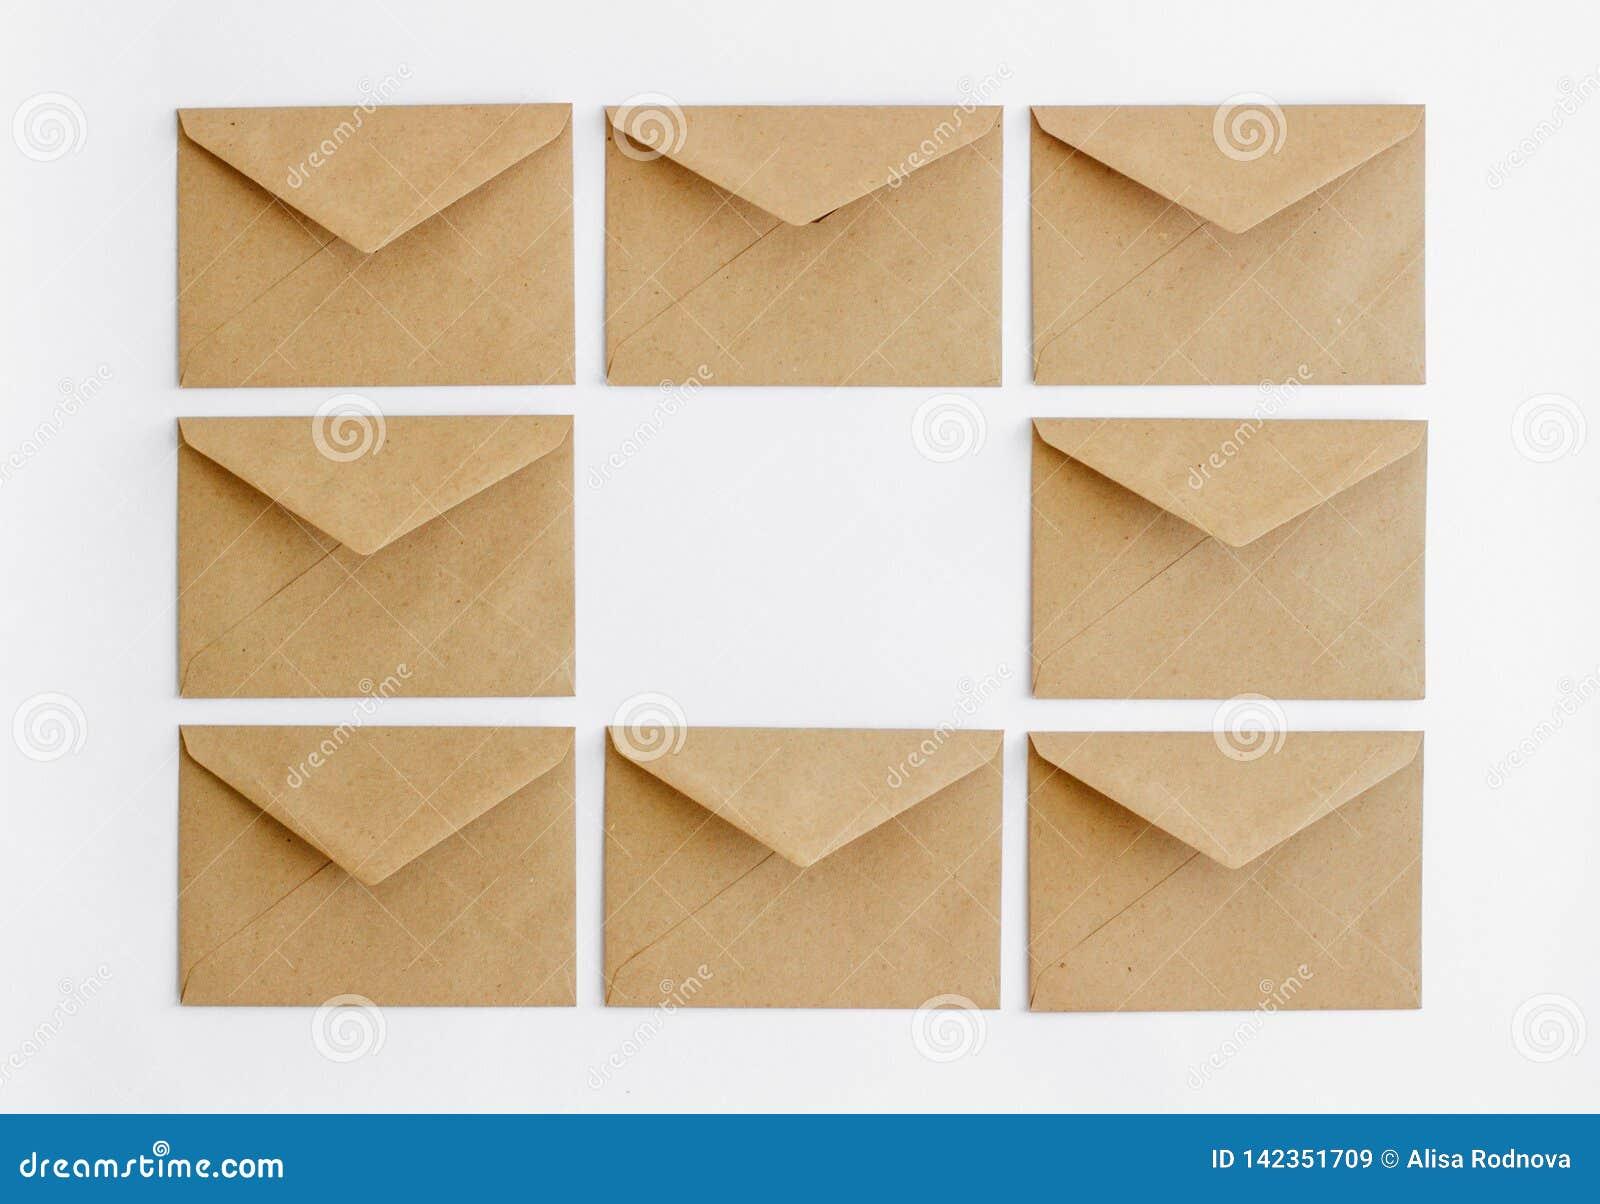 Kraft postal envelopes on a white background.